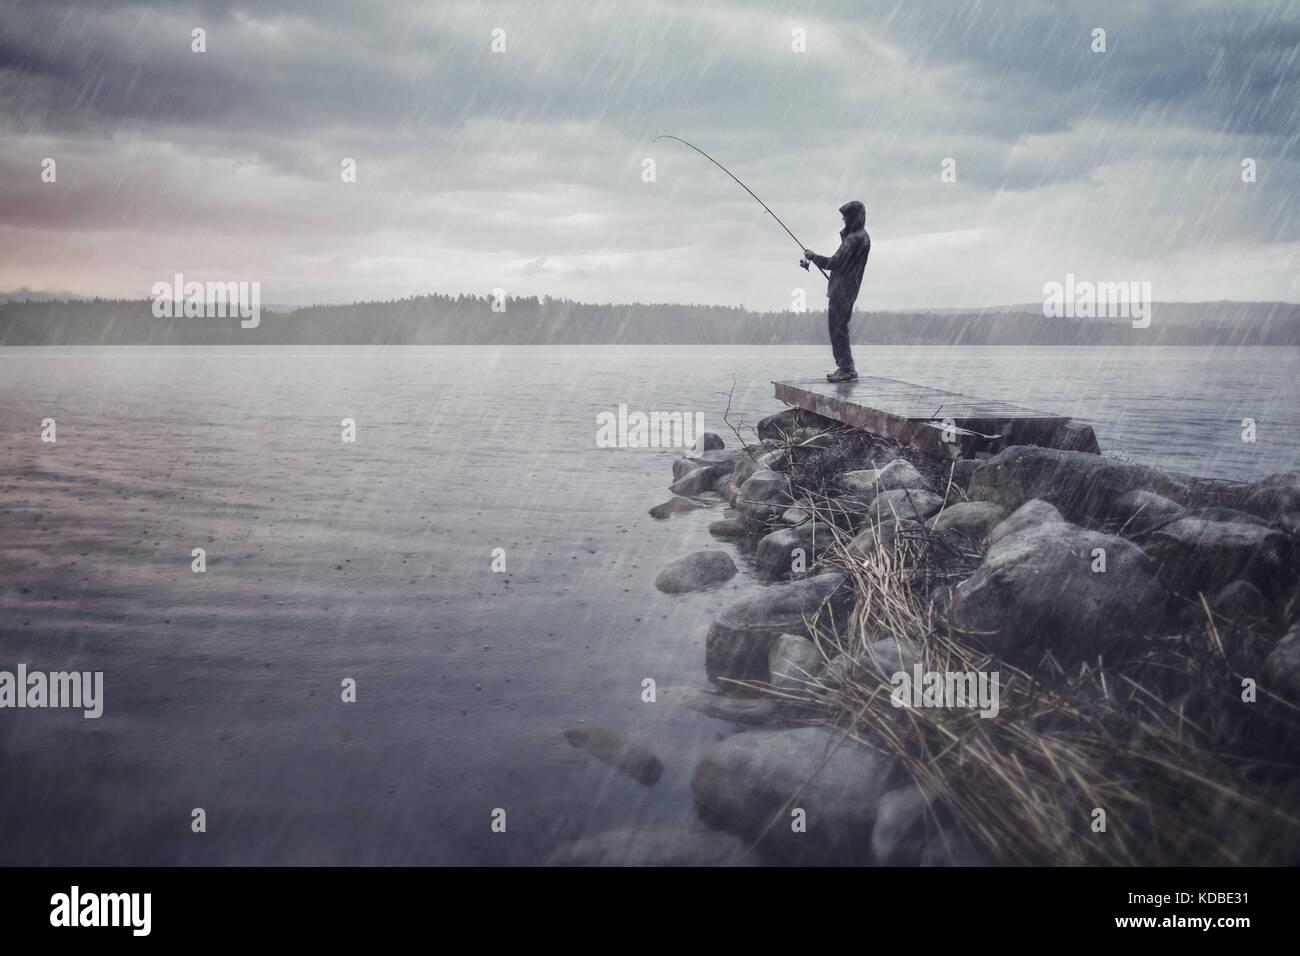 Man at a lake fishing in the rain - Stock Image